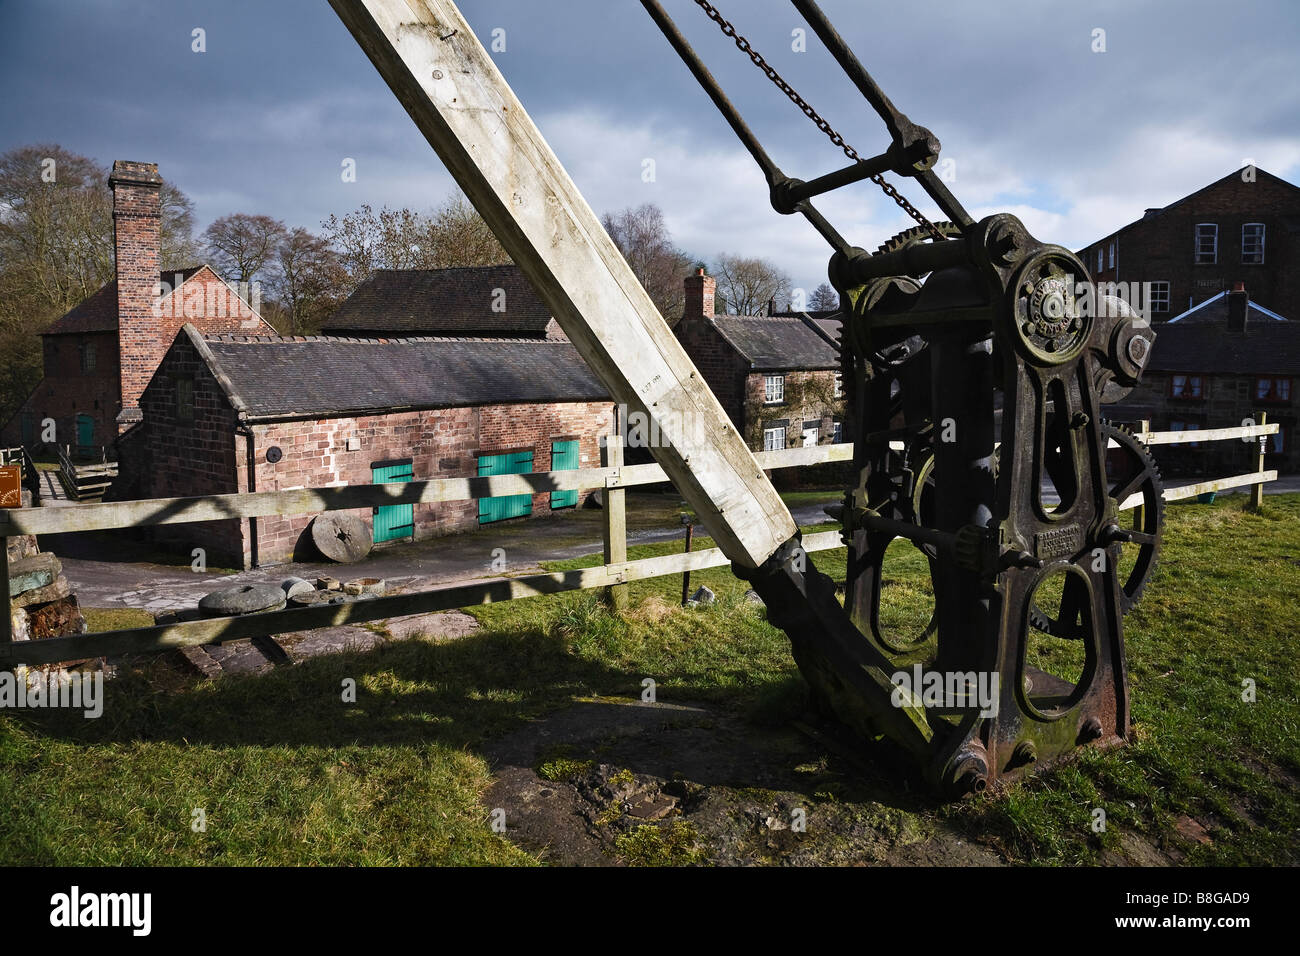 Cheddleton Flint Mill, near Leek, Staffordshire, England - Stock Image